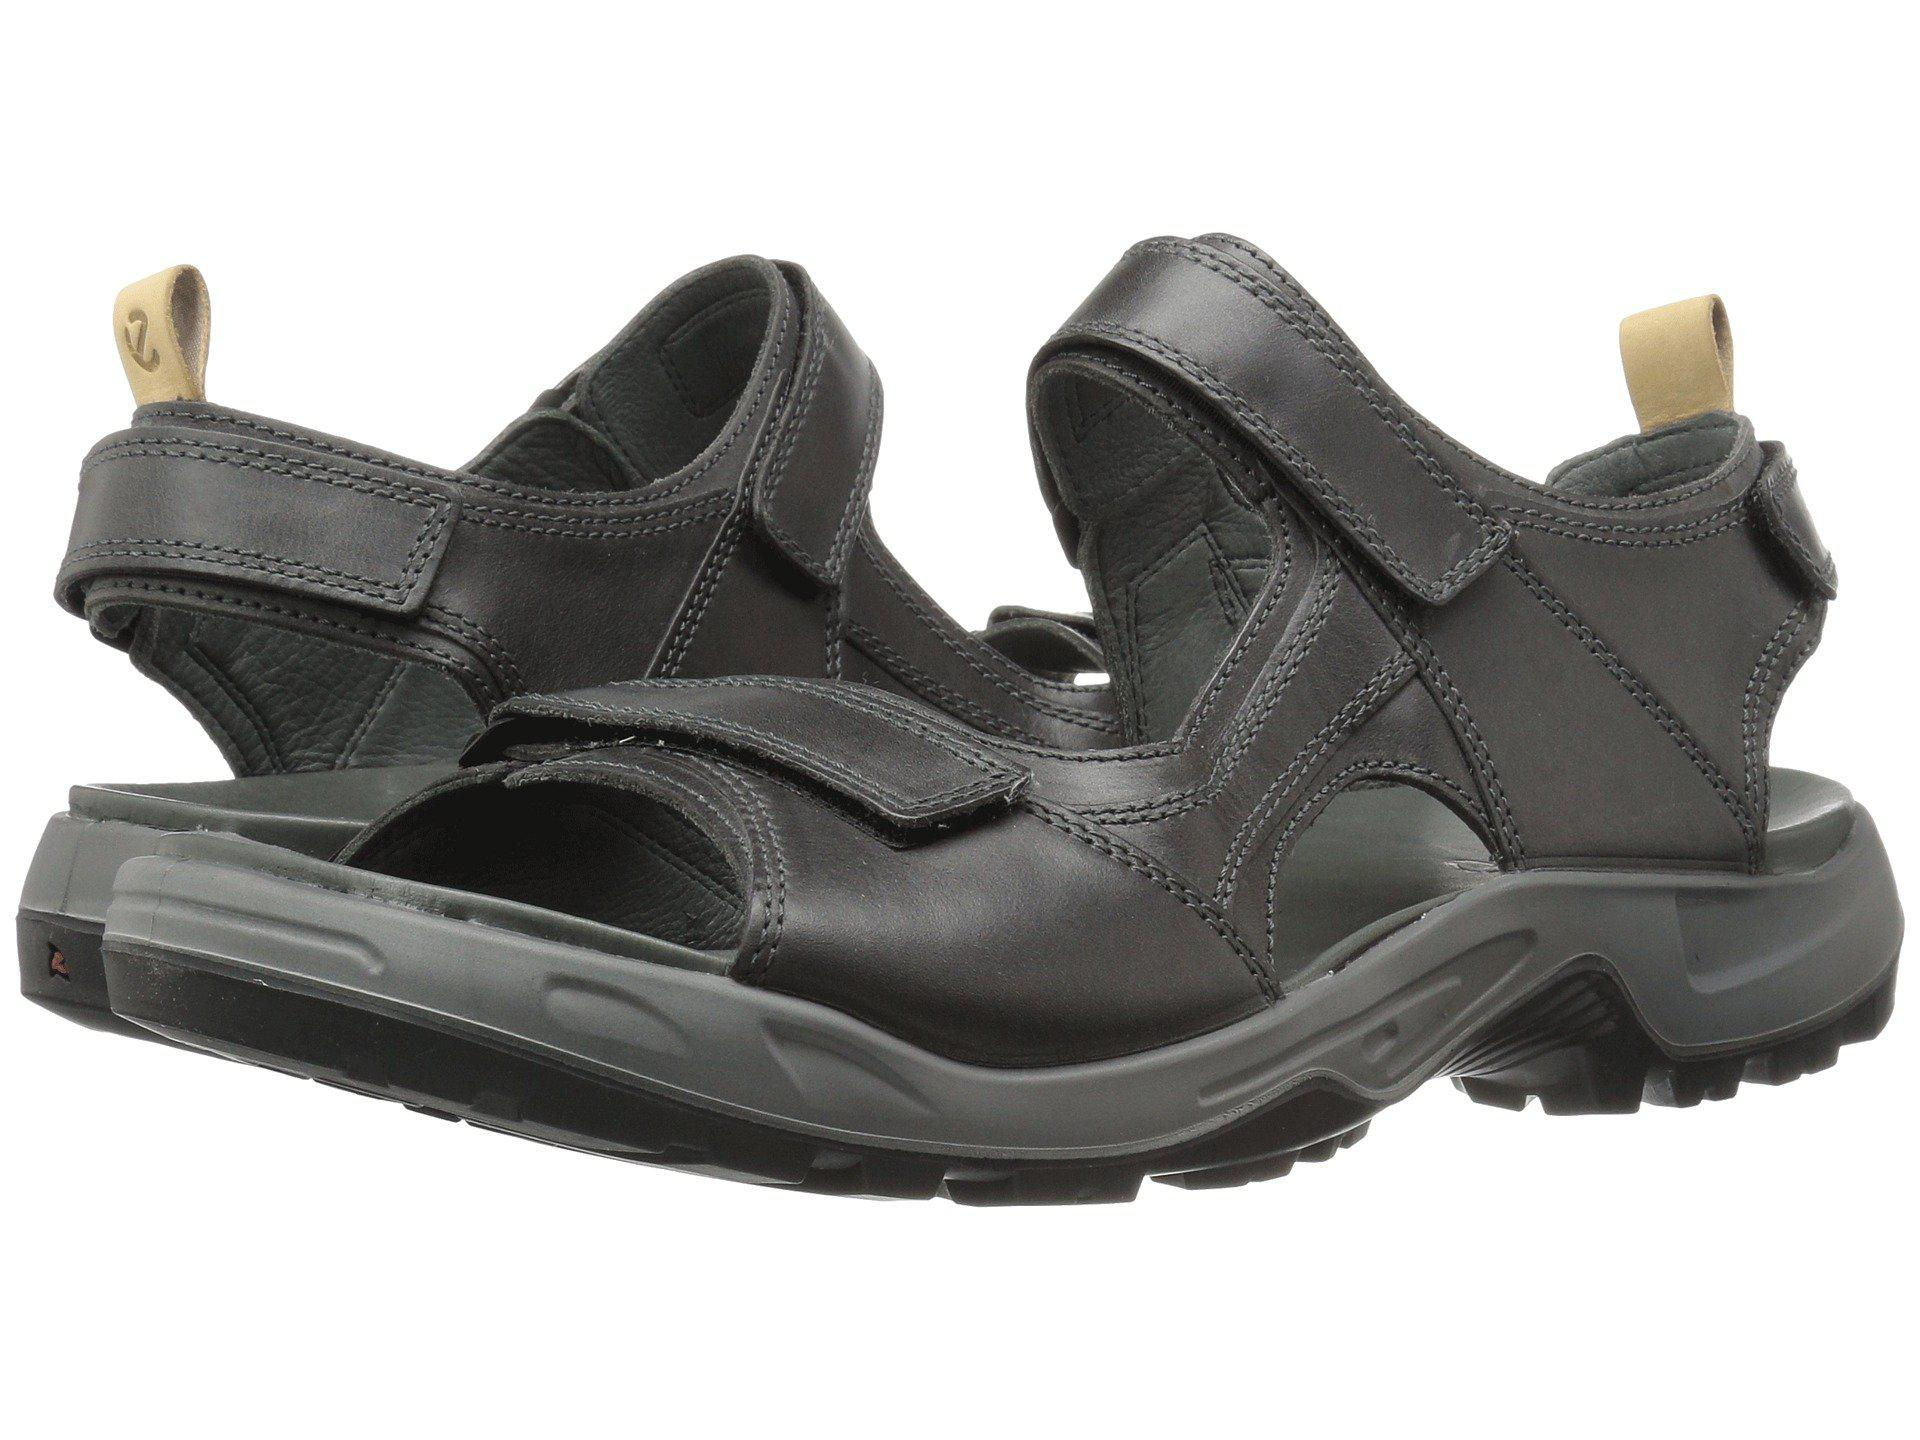 47a65352f1ae Lyst - Ecco Offroad 2.0 Sandal (black powder) Men s Sandals for Men